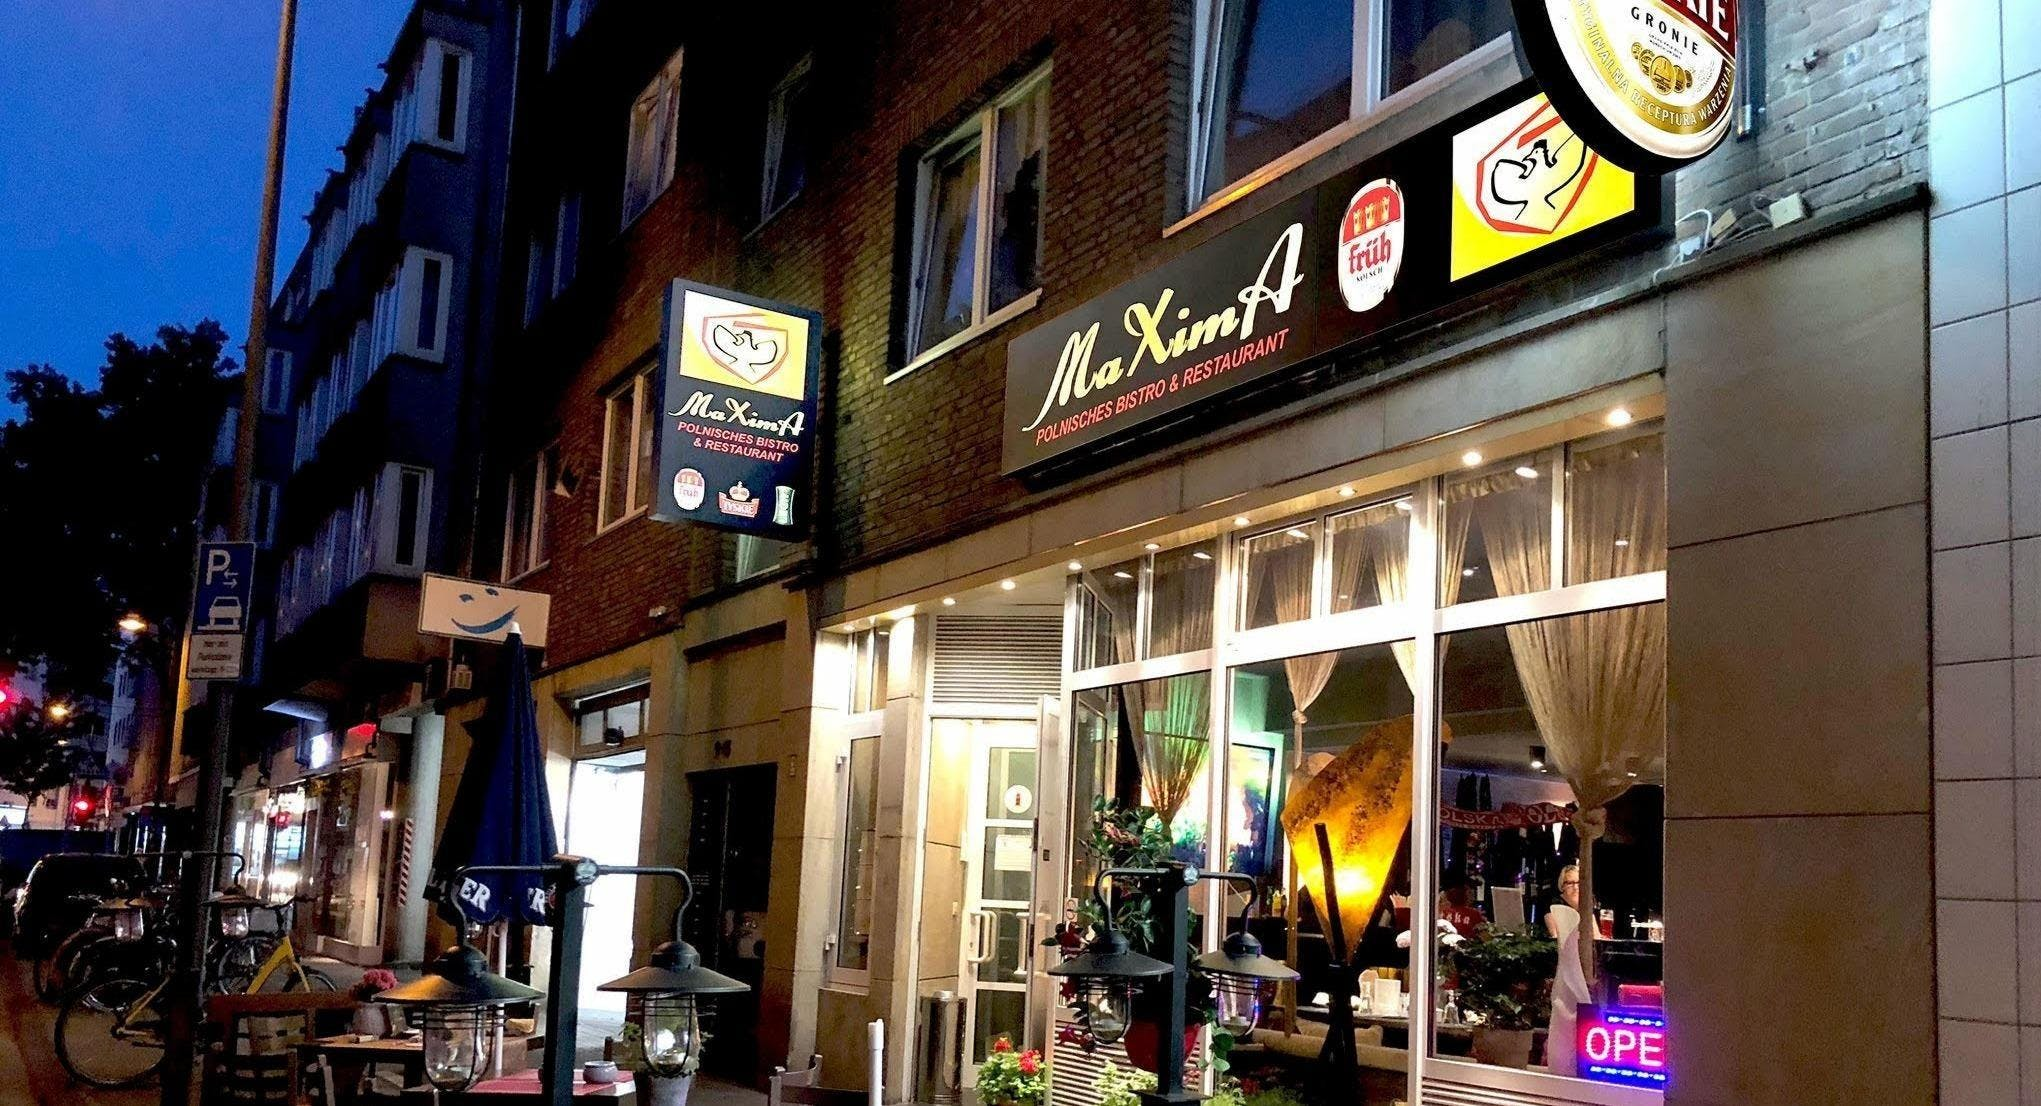 MaXimA Polnisches Bistro & Restaurant